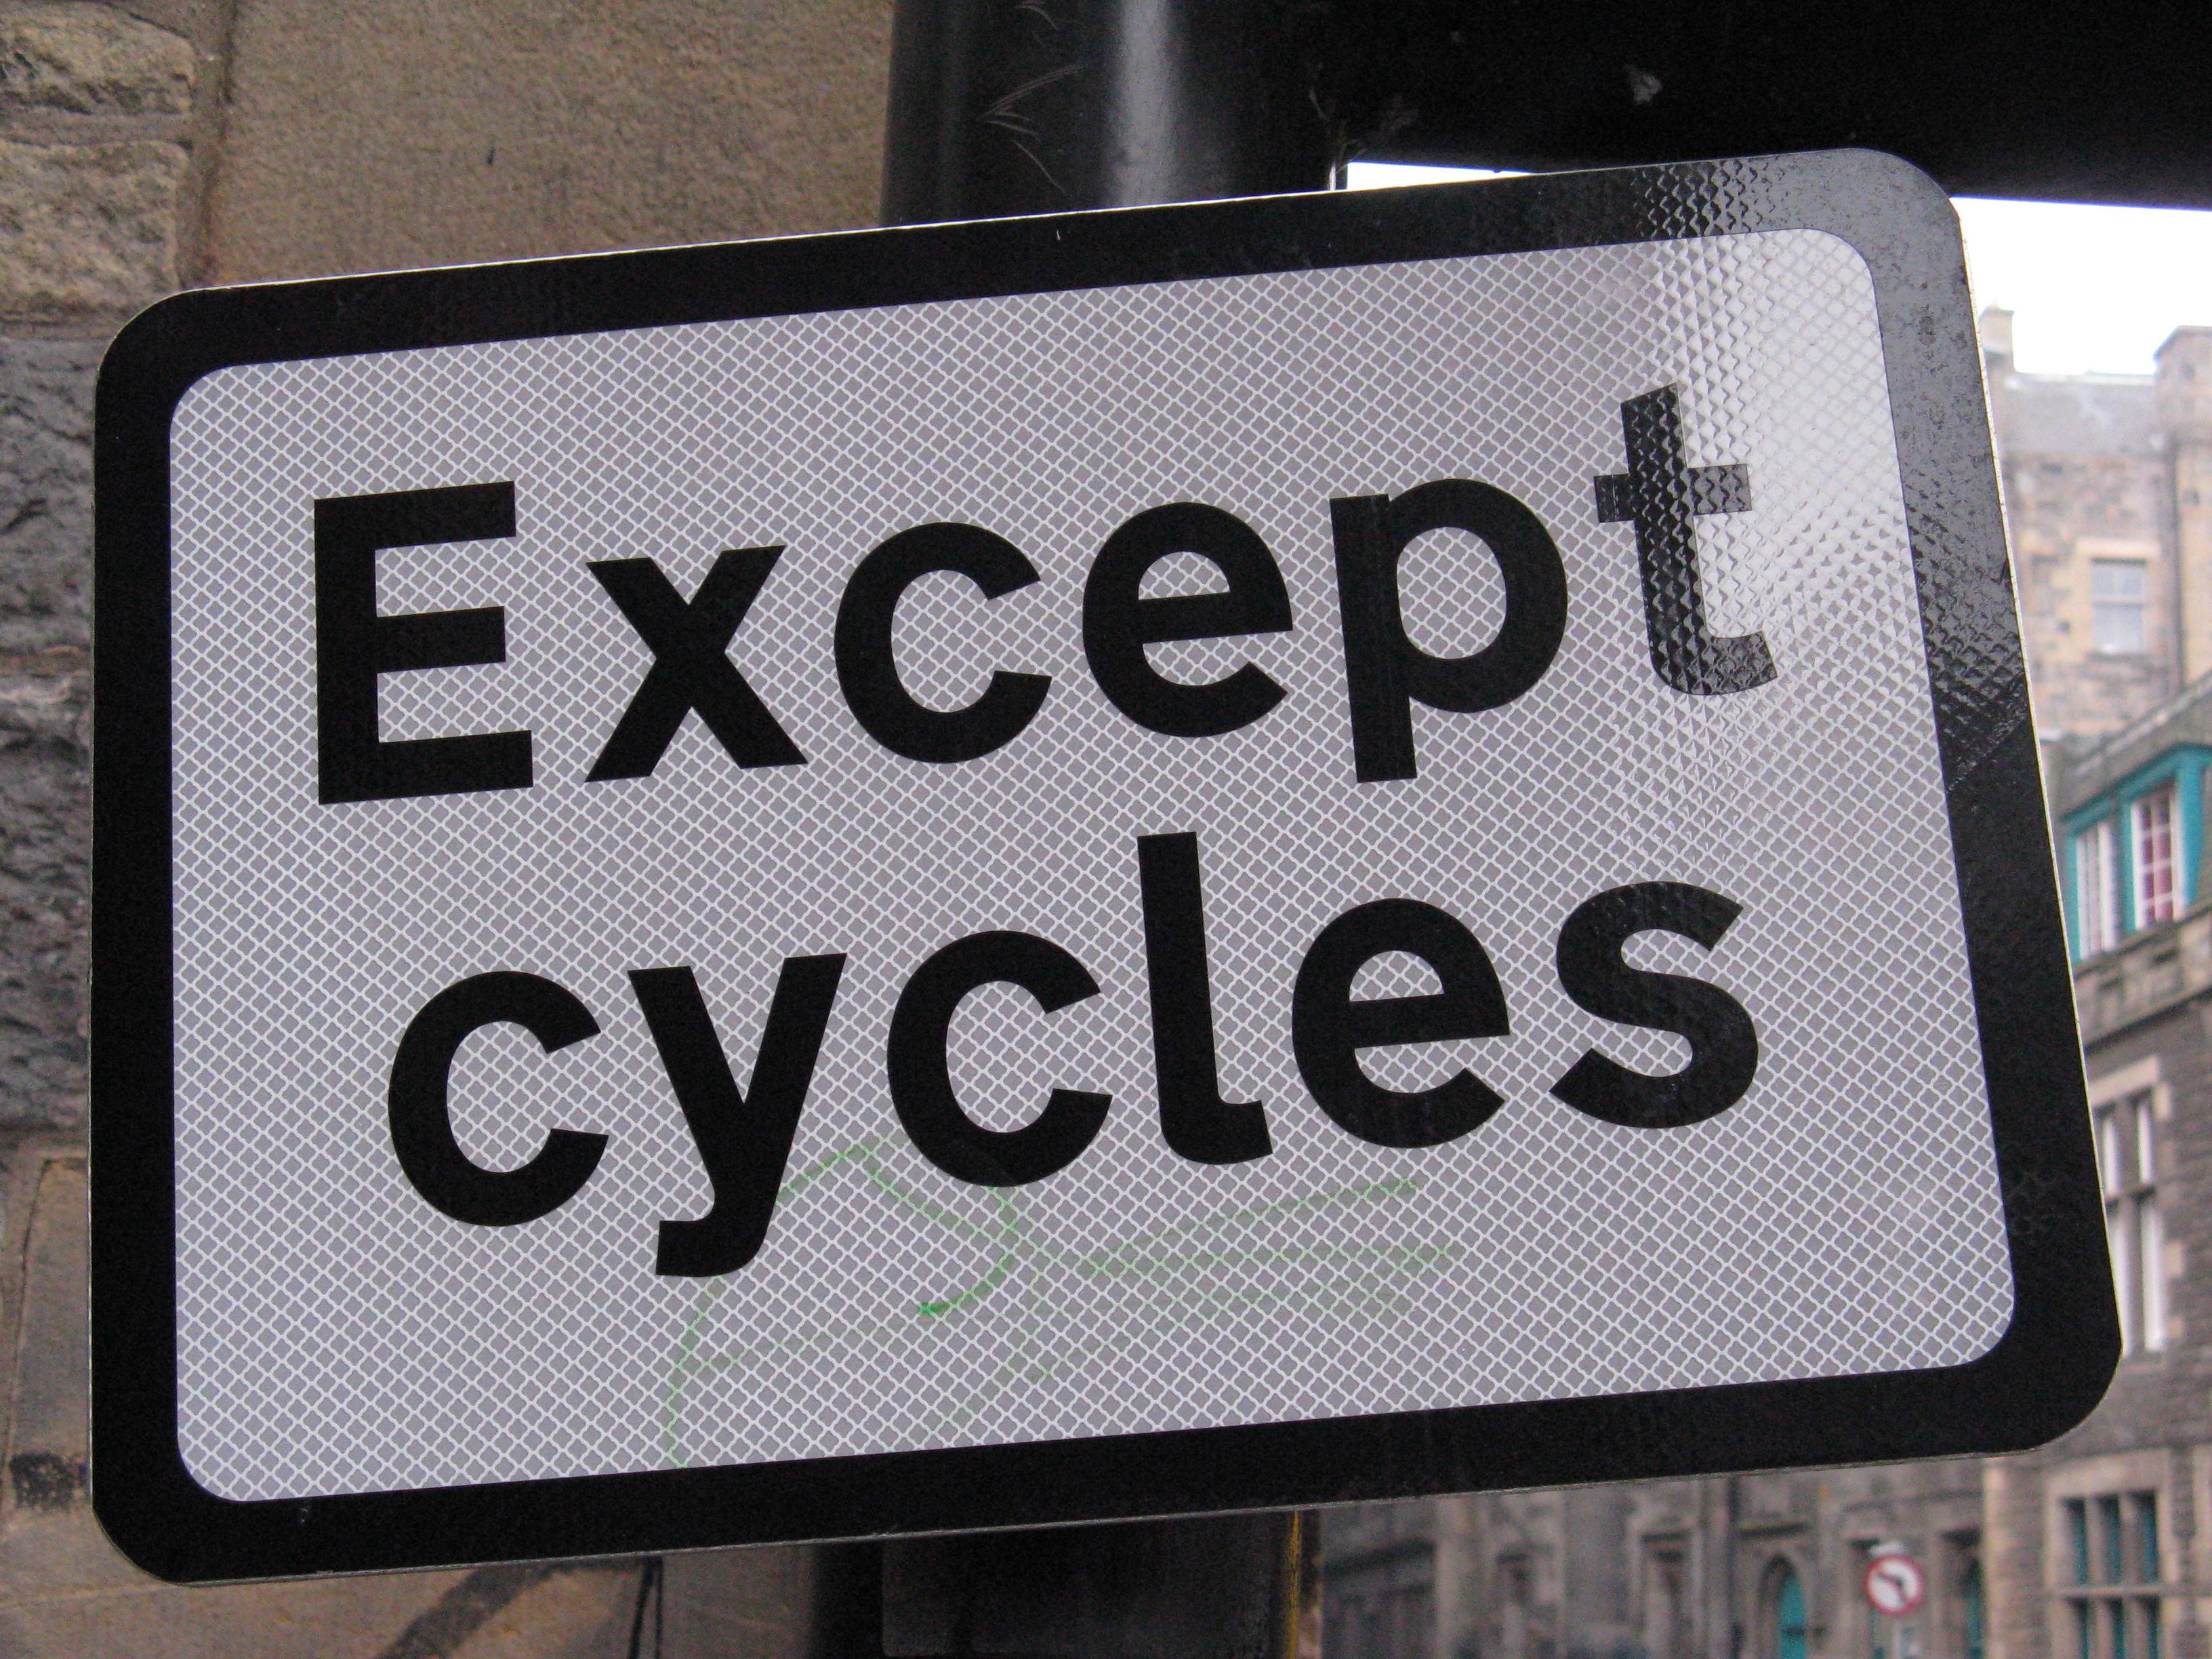 accept-cycles.jpg